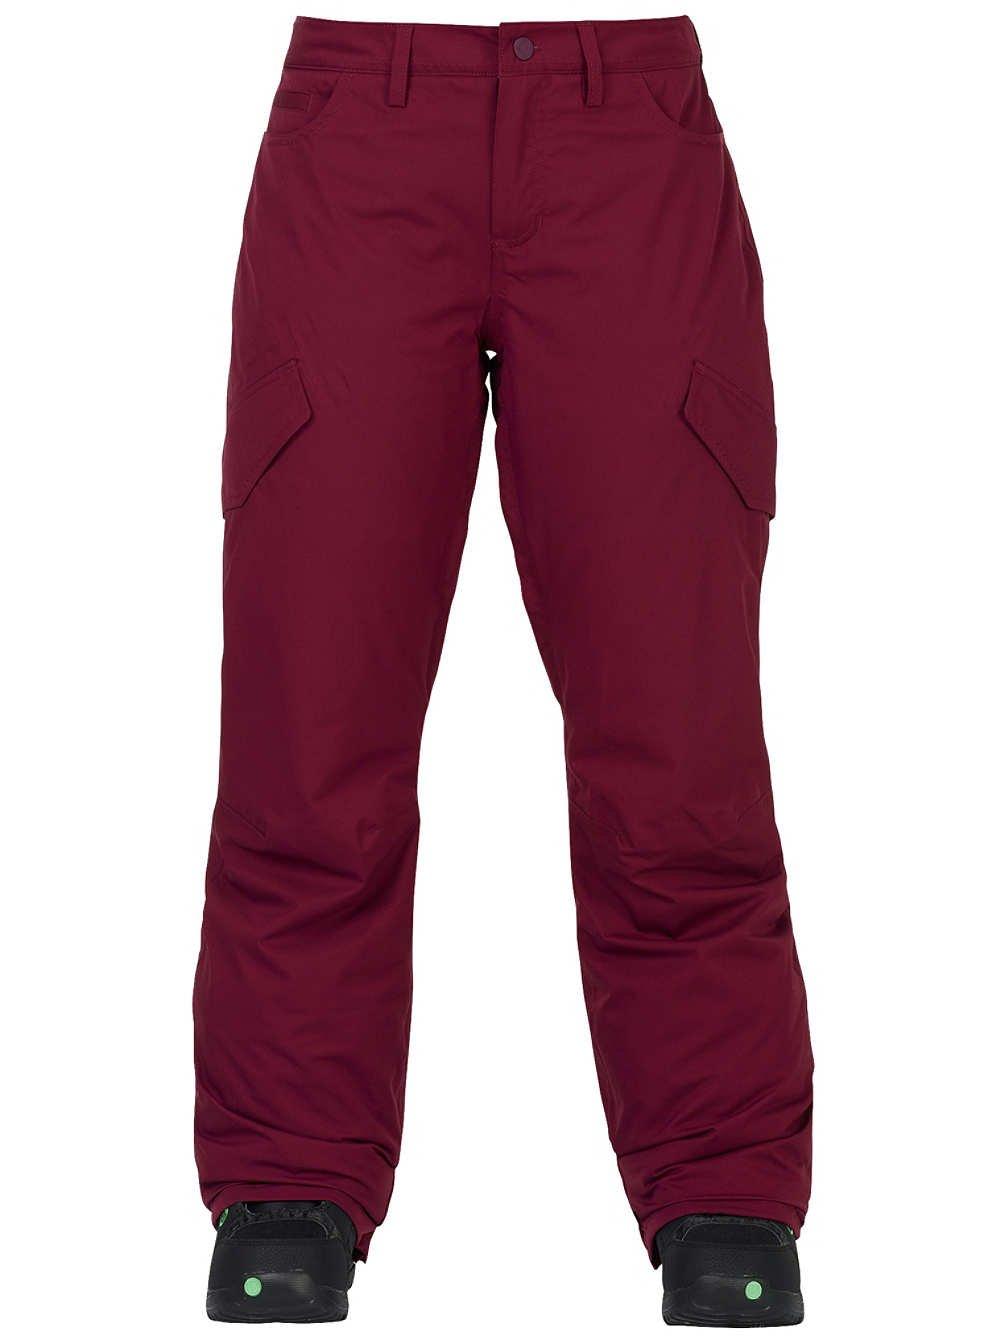 2018 Women's Burton Fly Snowboard Ski Pants Sangria Size Medium